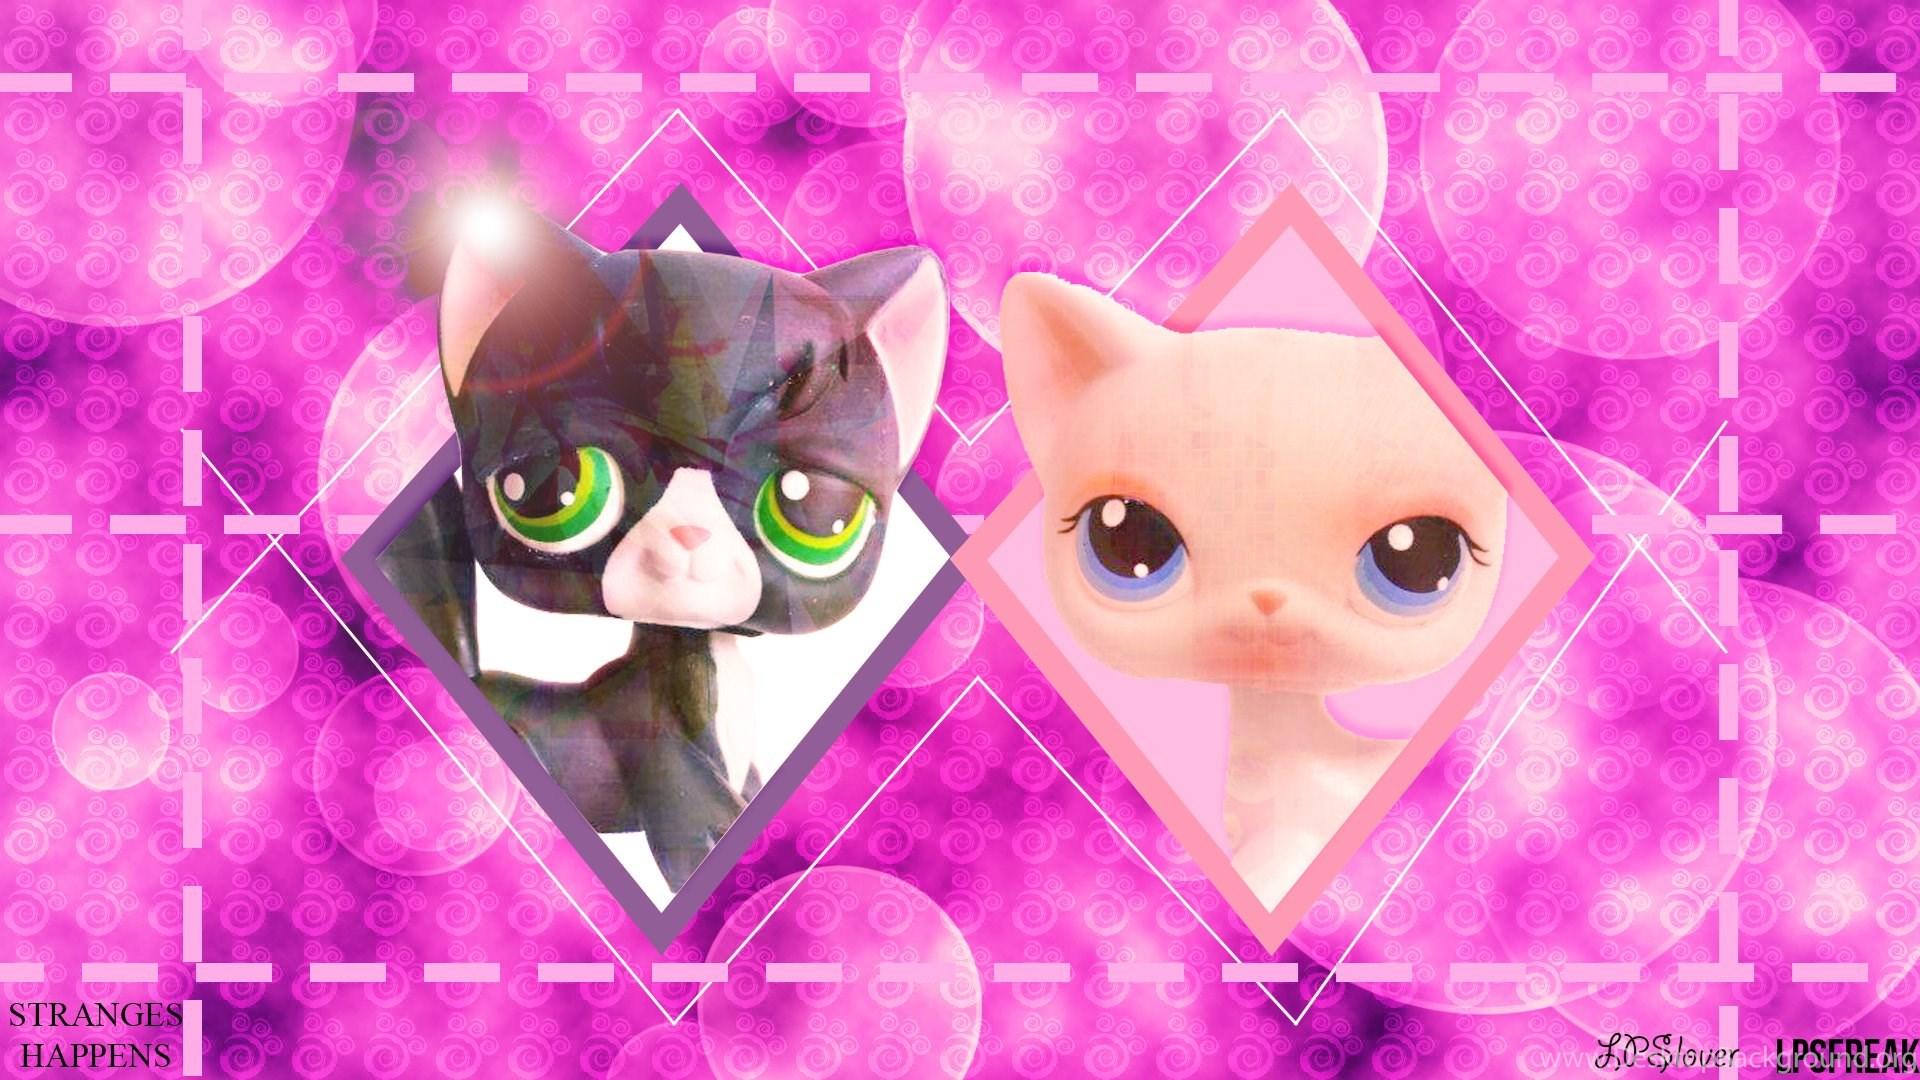 Littlest pet shop online wallpapers by illumnious on deviantart popular voltagebd Choice Image